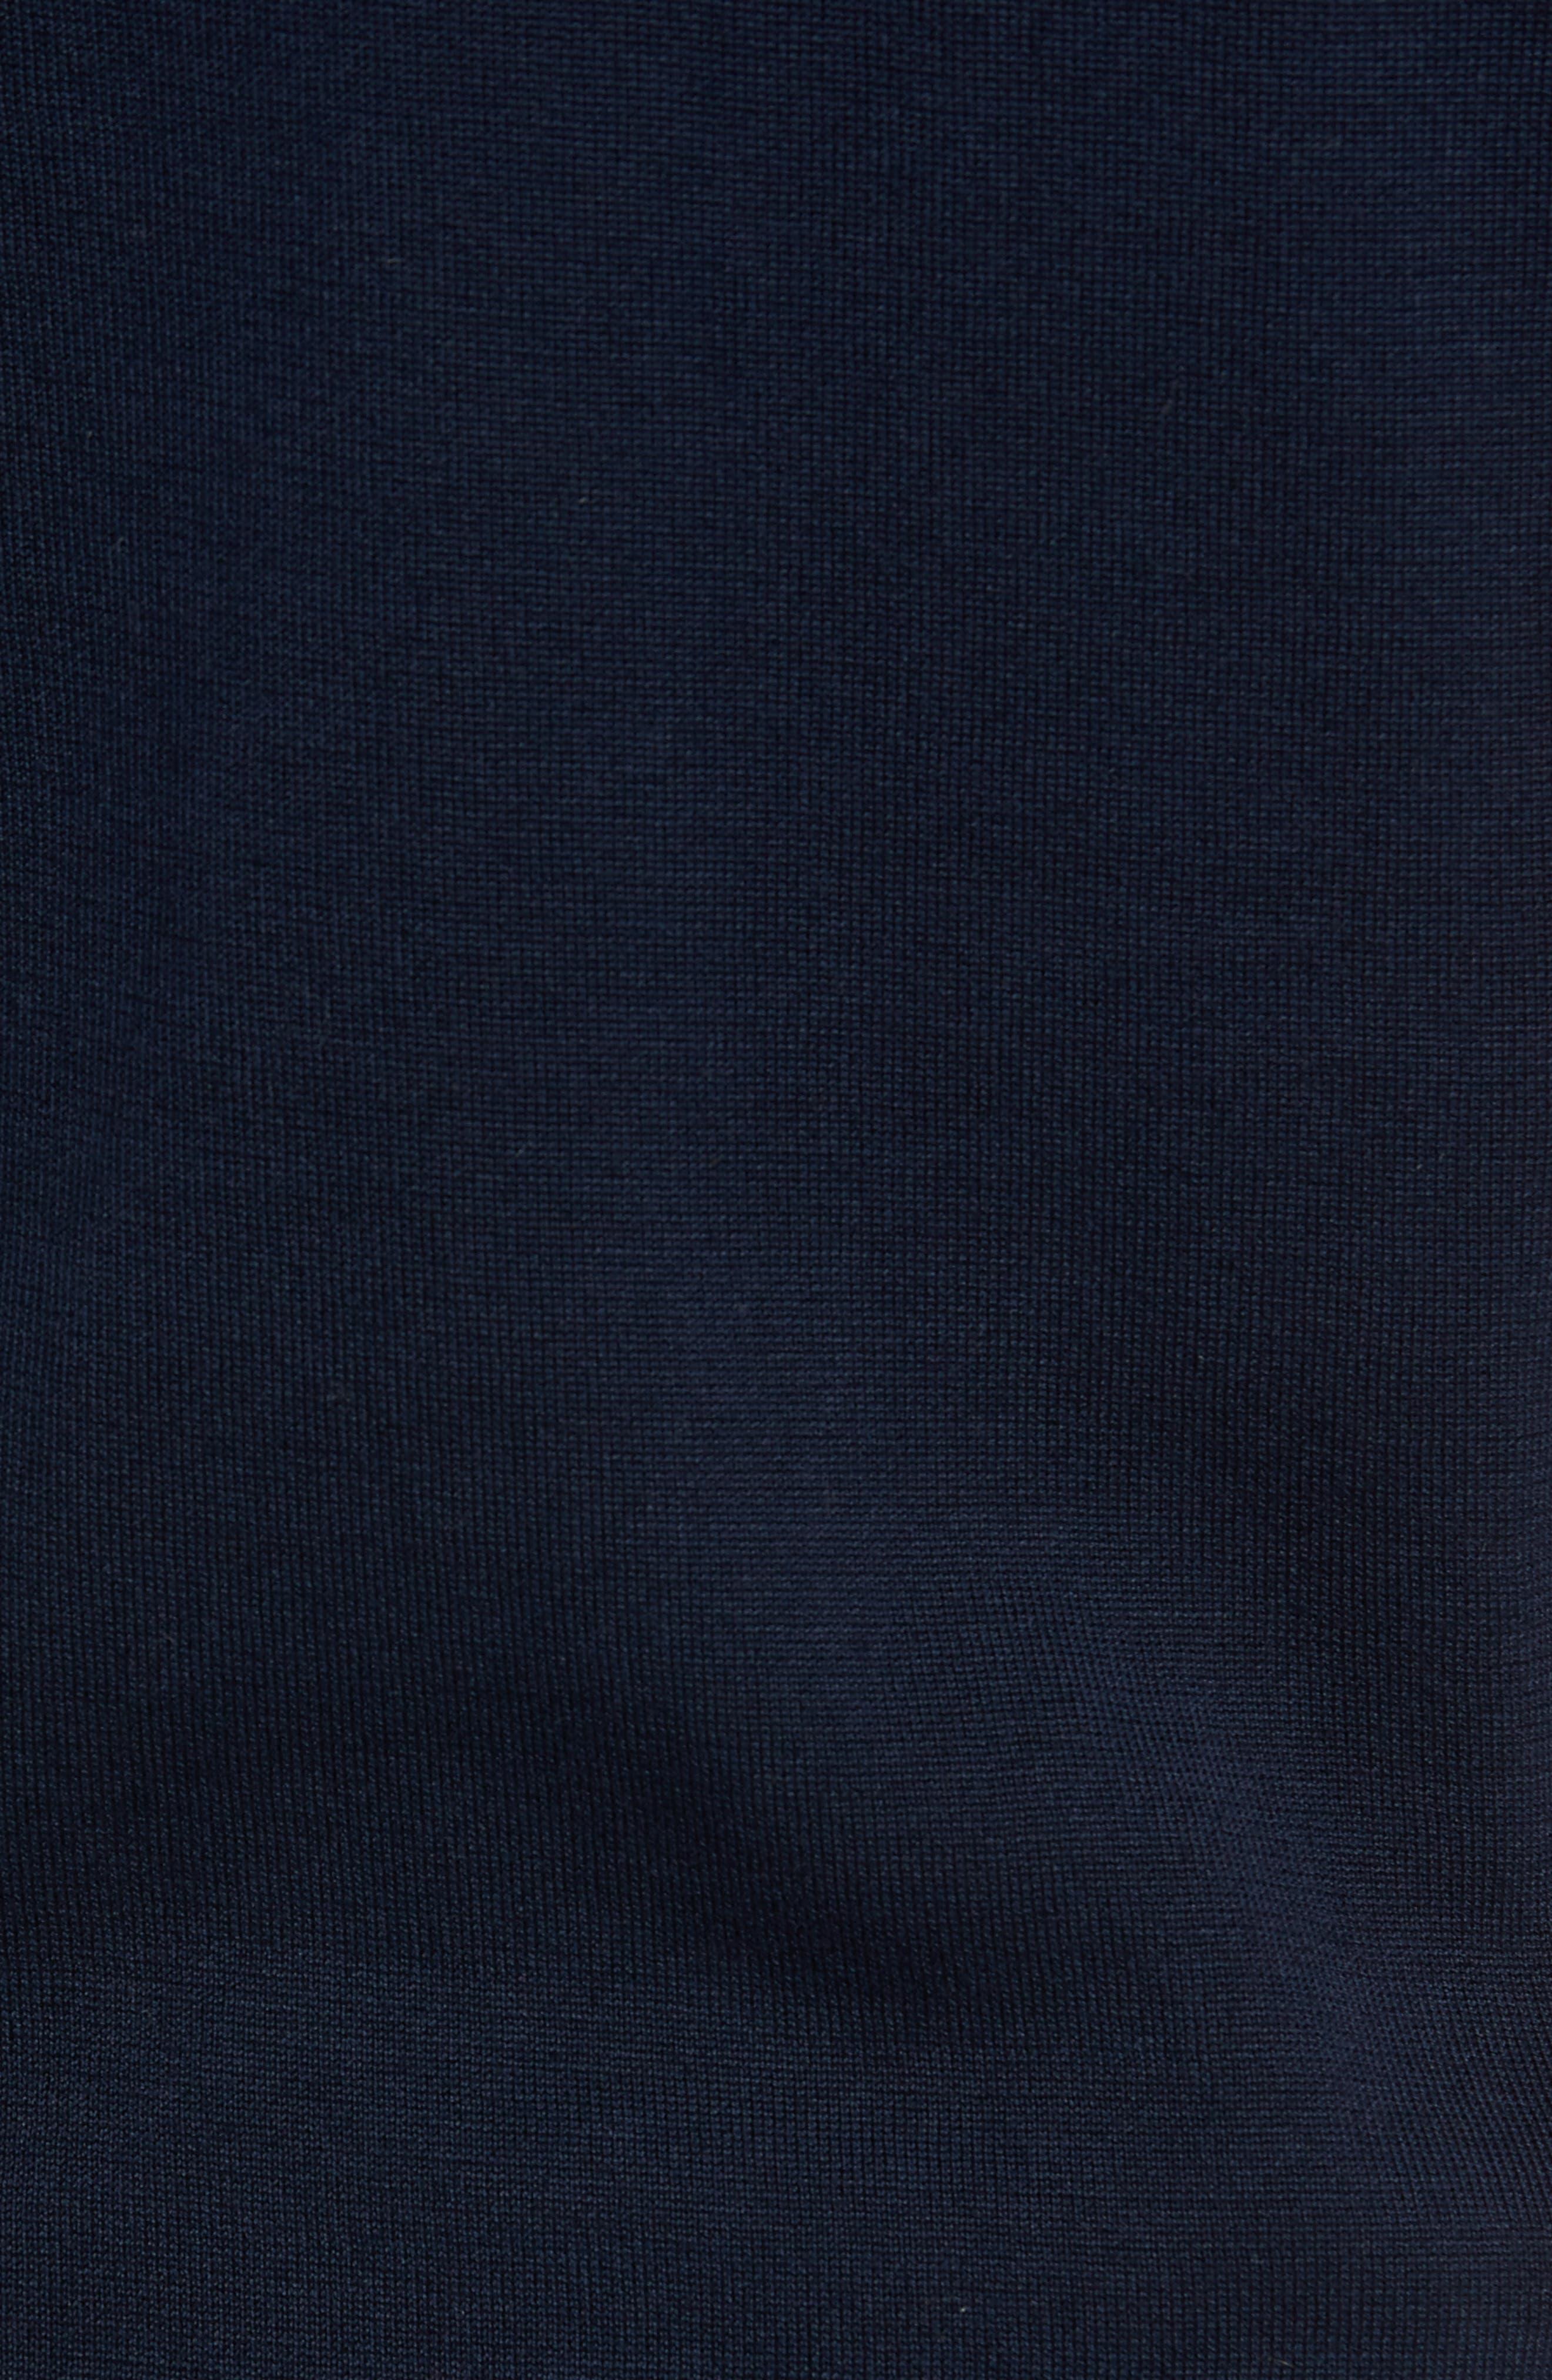 Trim Fit Stripe Polo,                             Alternate thumbnail 5, color,                             022